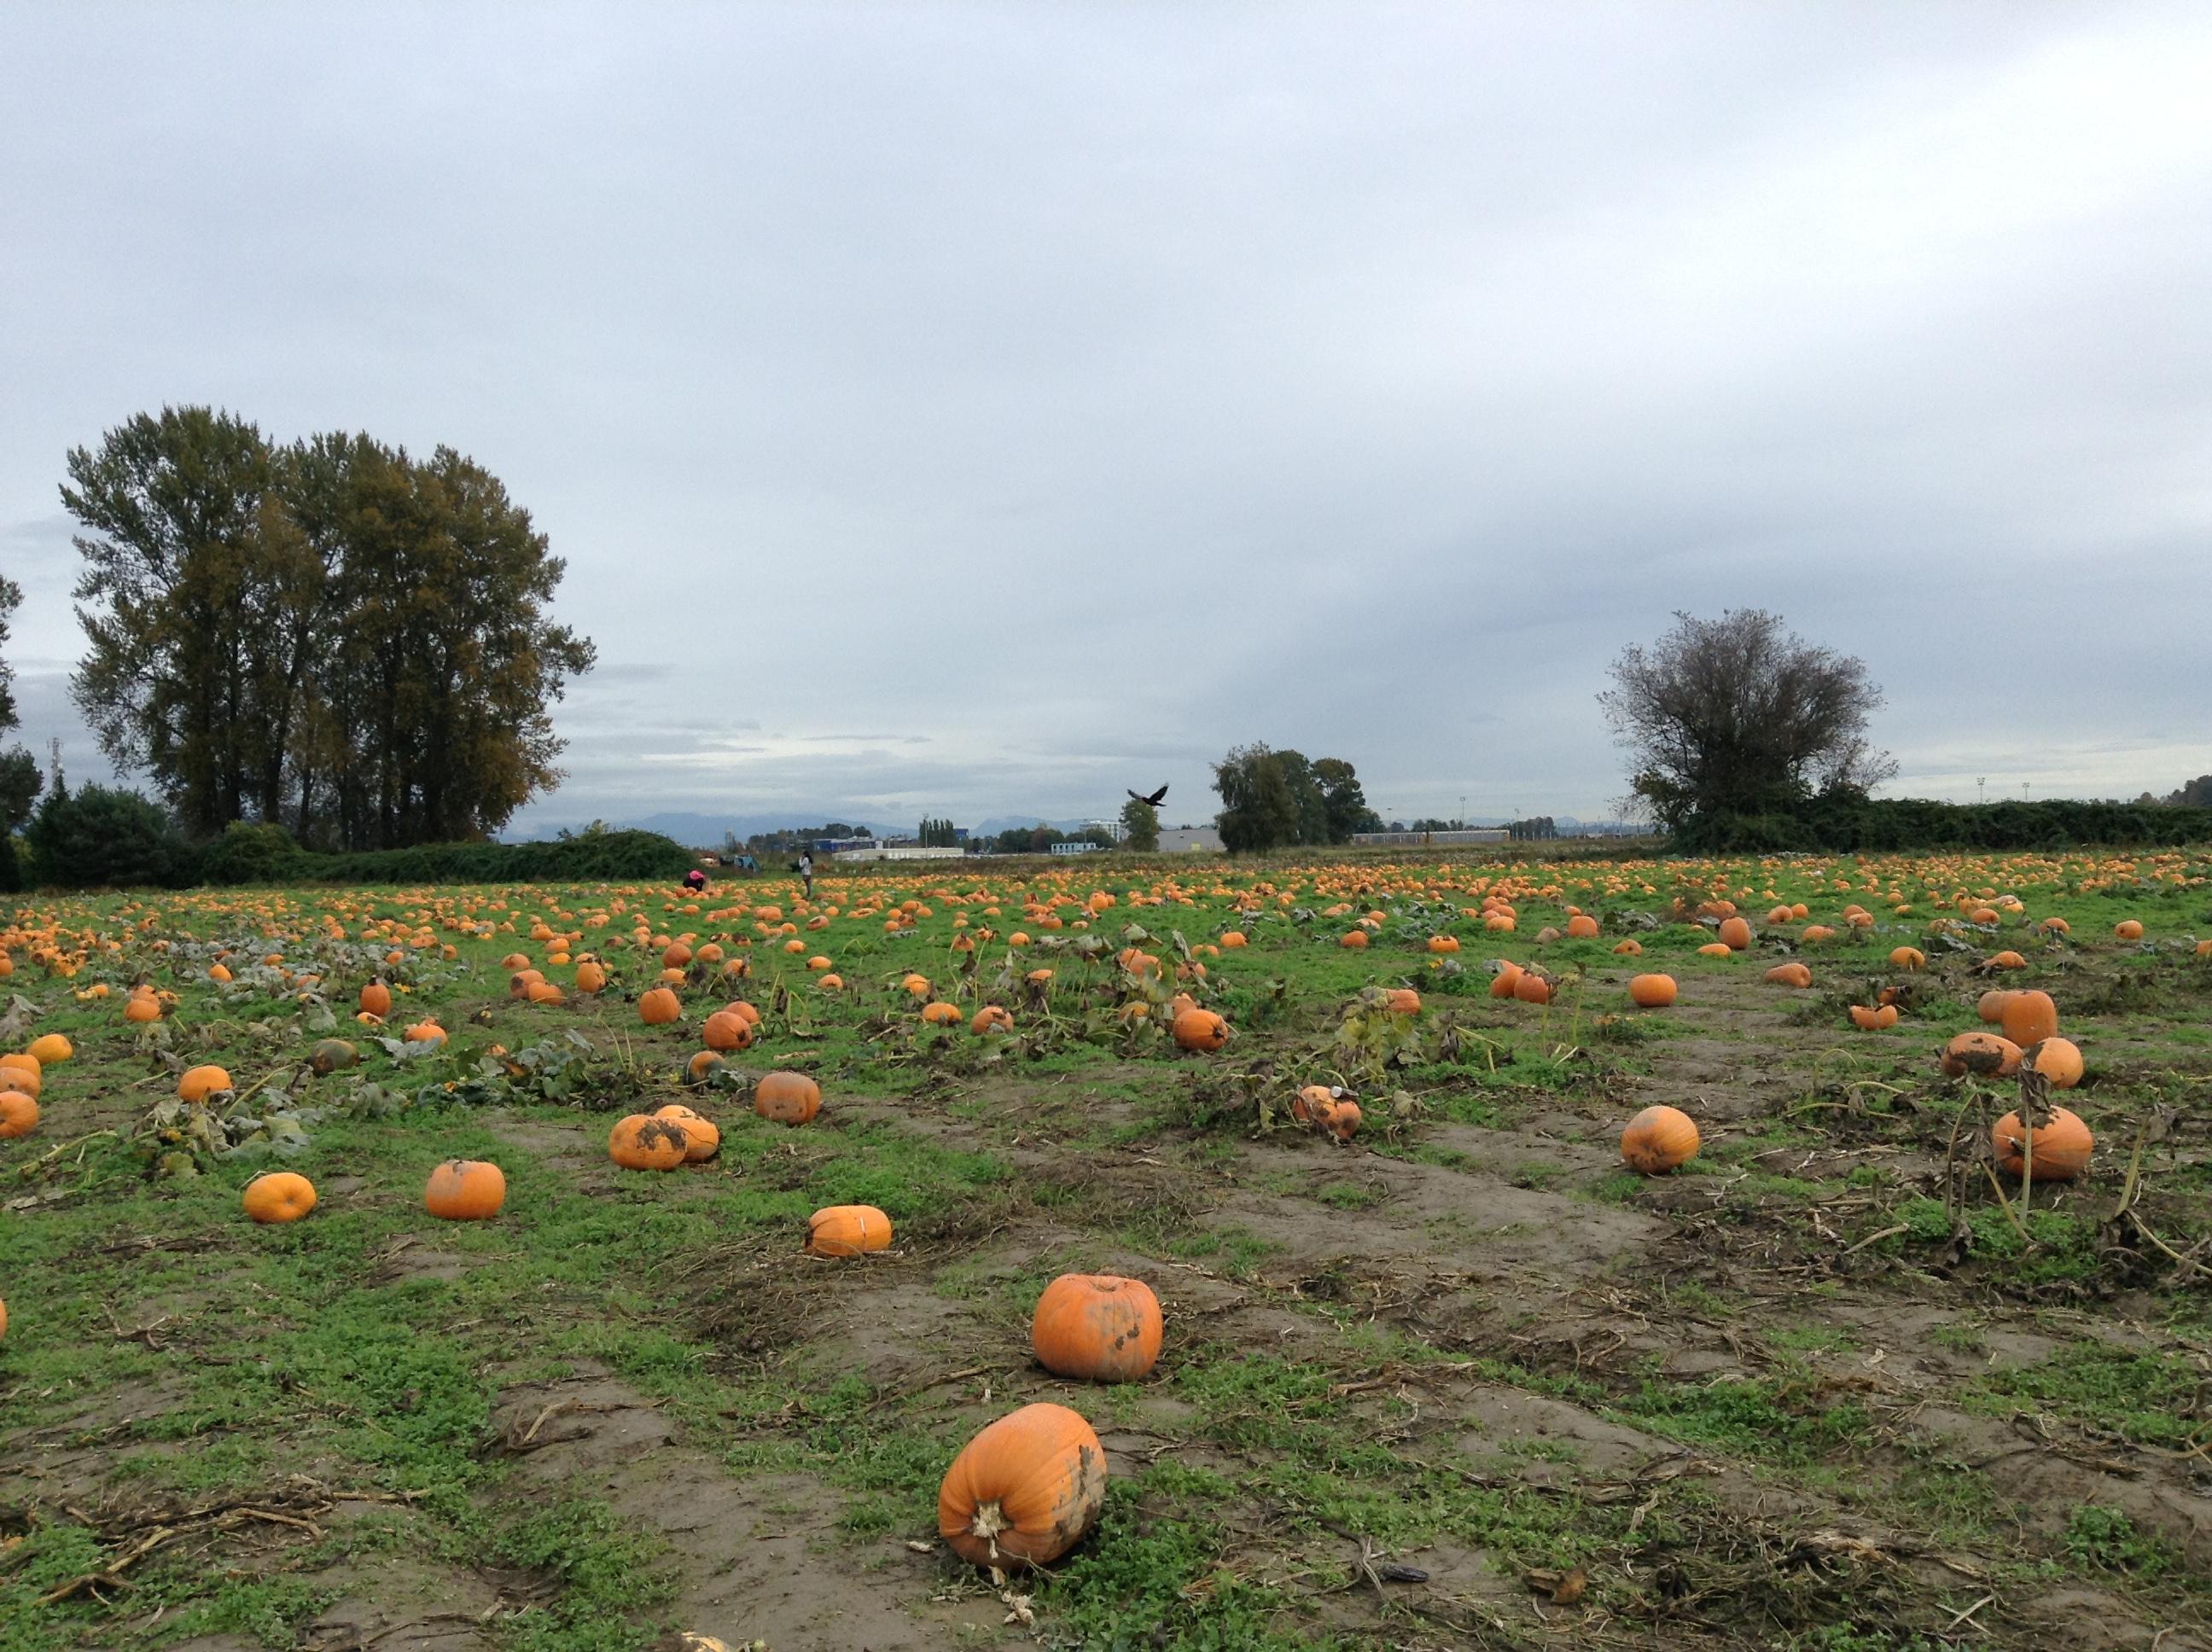 Pumpkin Patch☆海外保育ボランティアで体験できる本場のハロウィーン